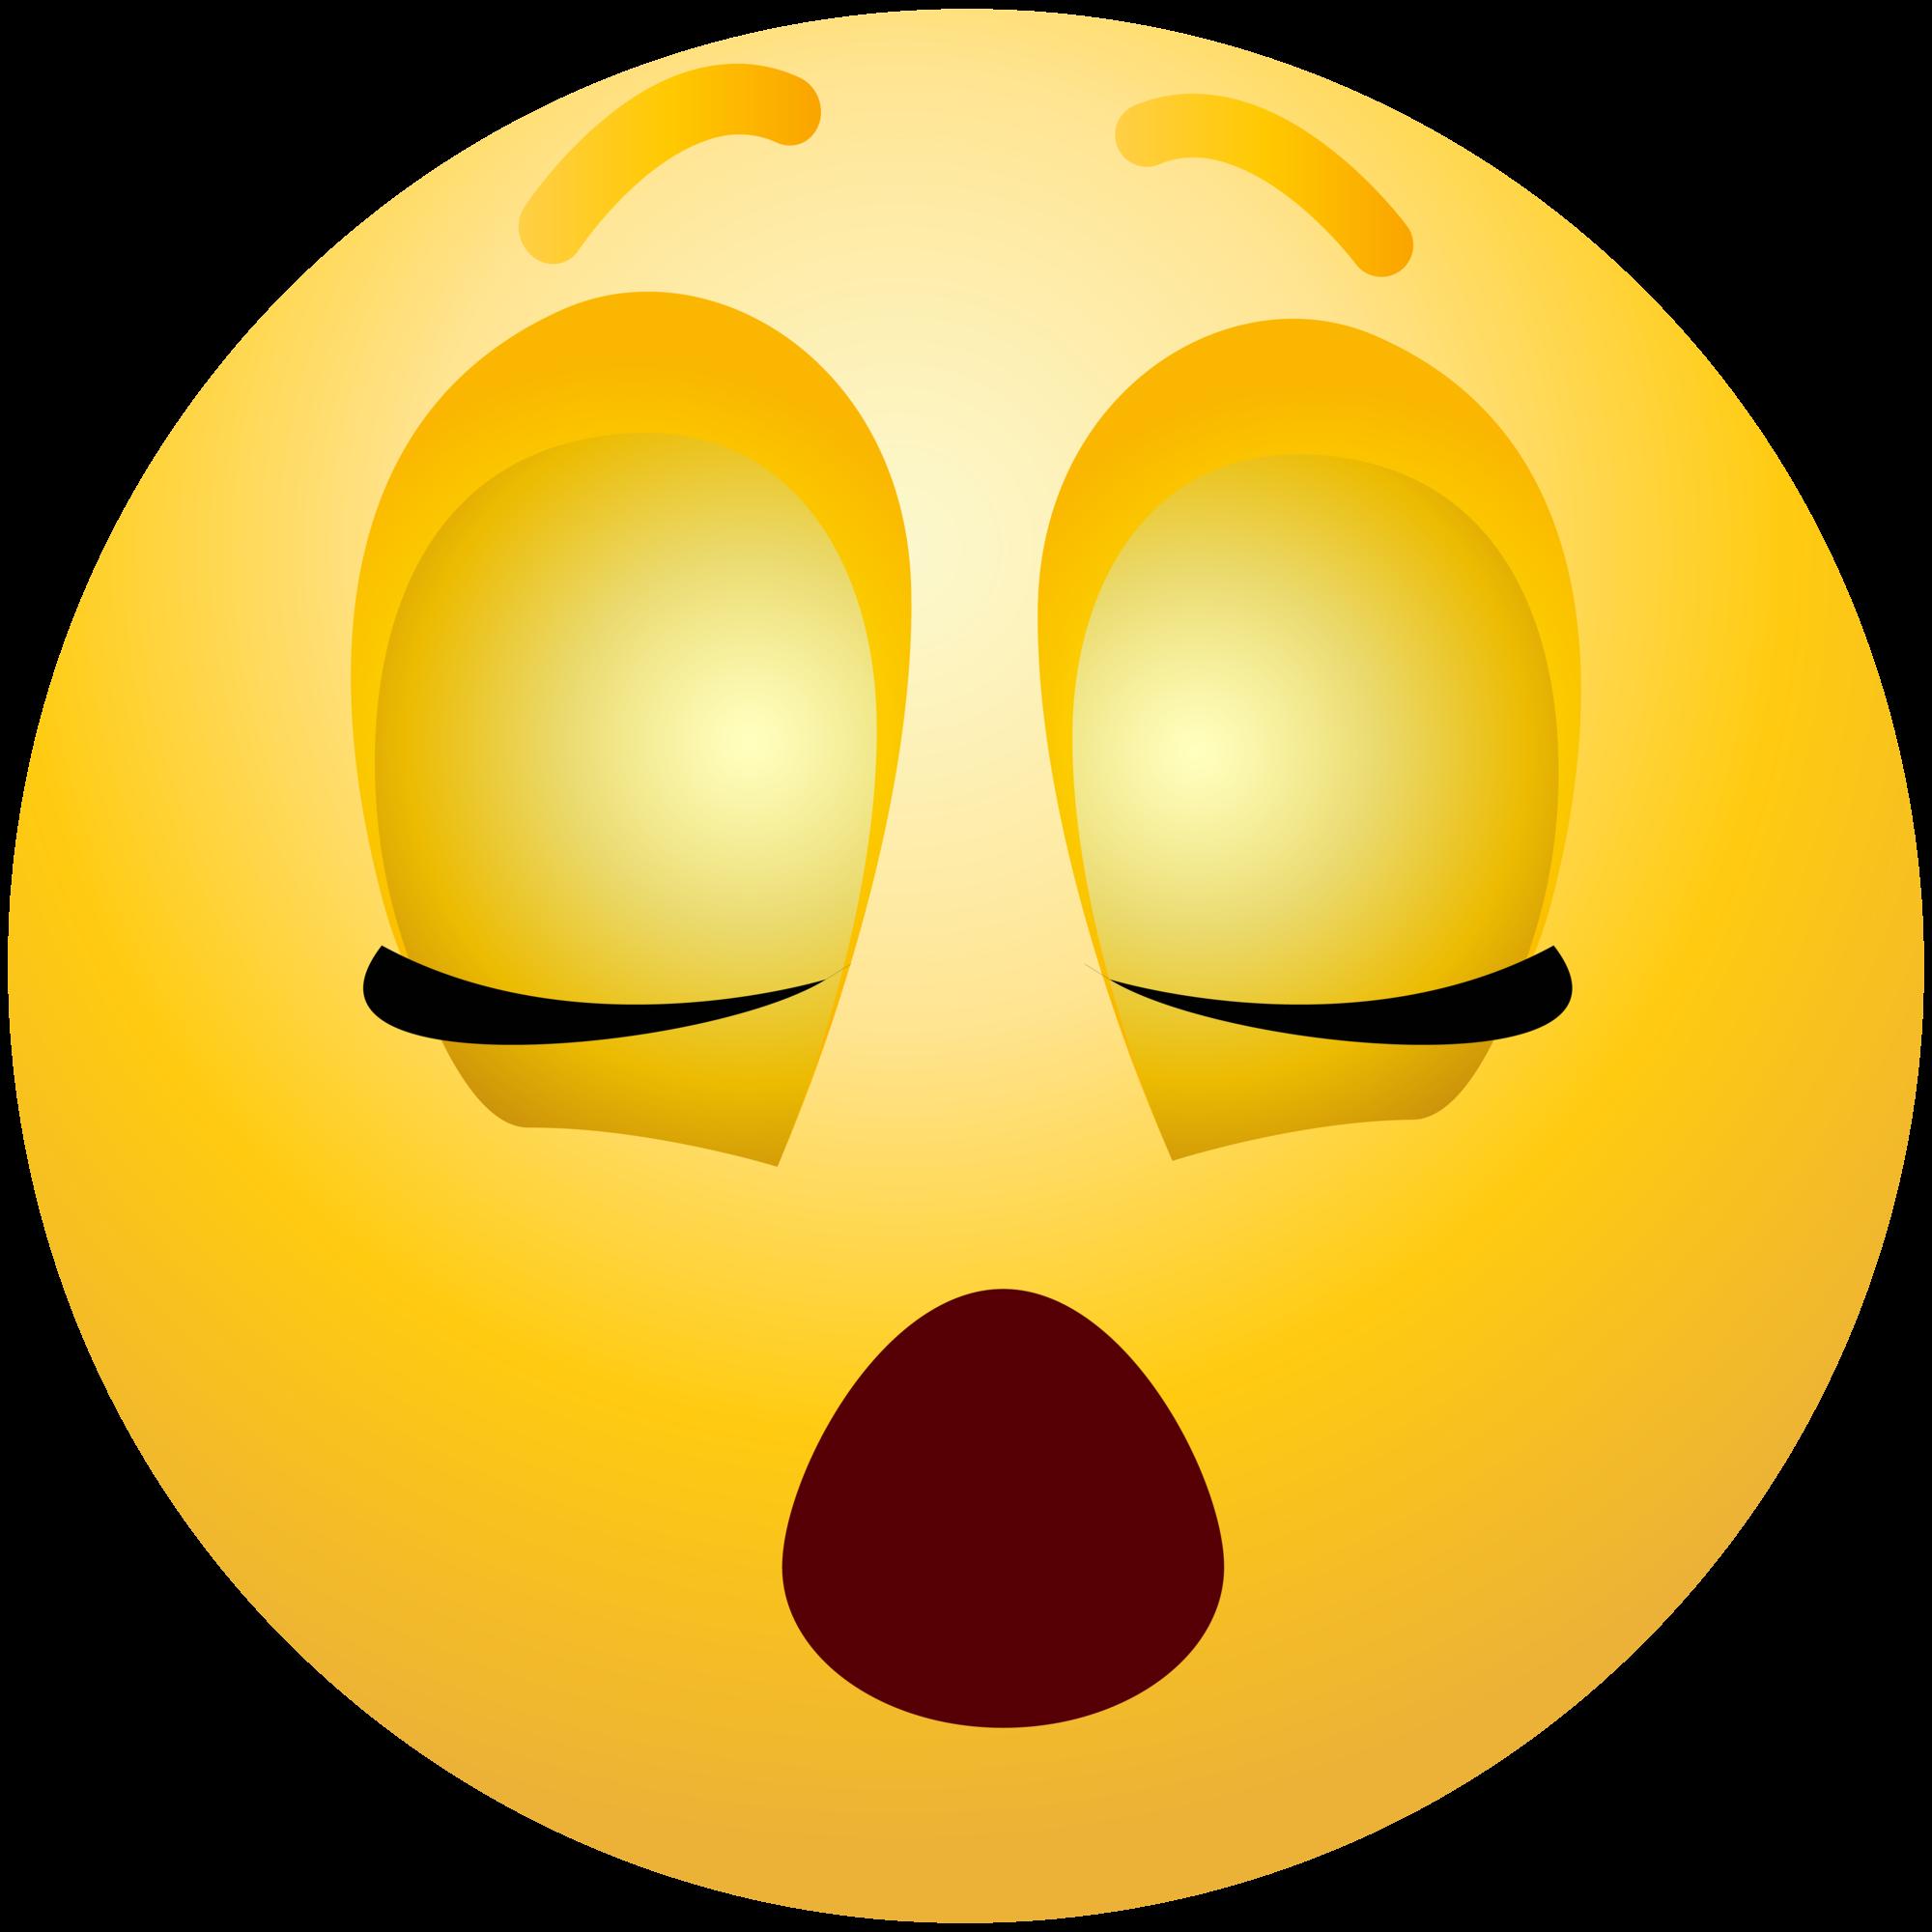 Emoji clipart nose. Sleeping emoticon info